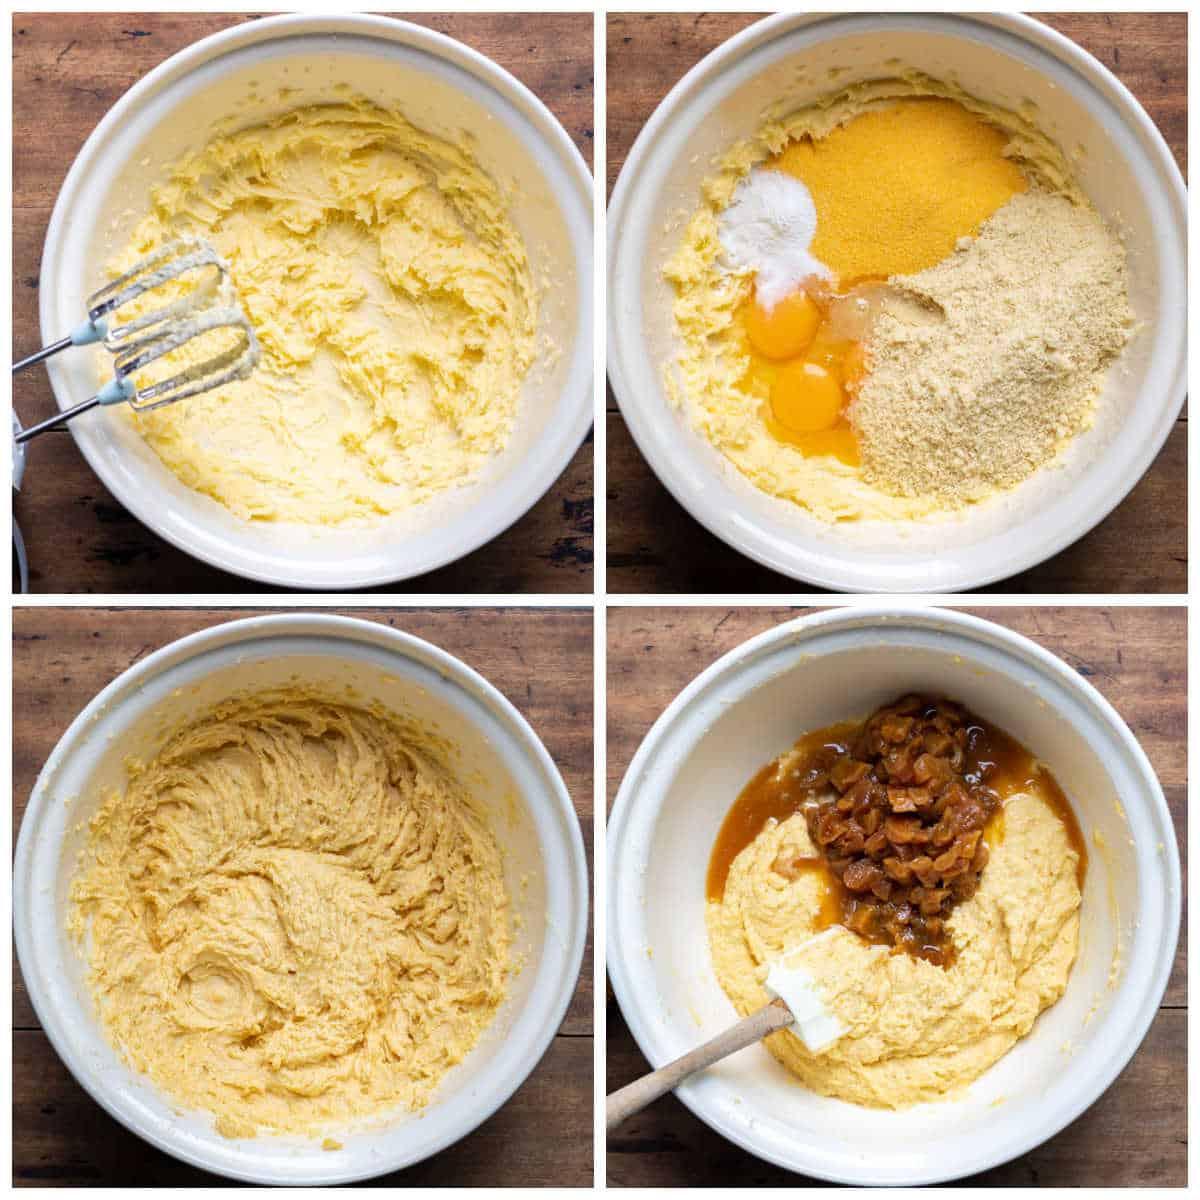 Collage of making almond cake batter.